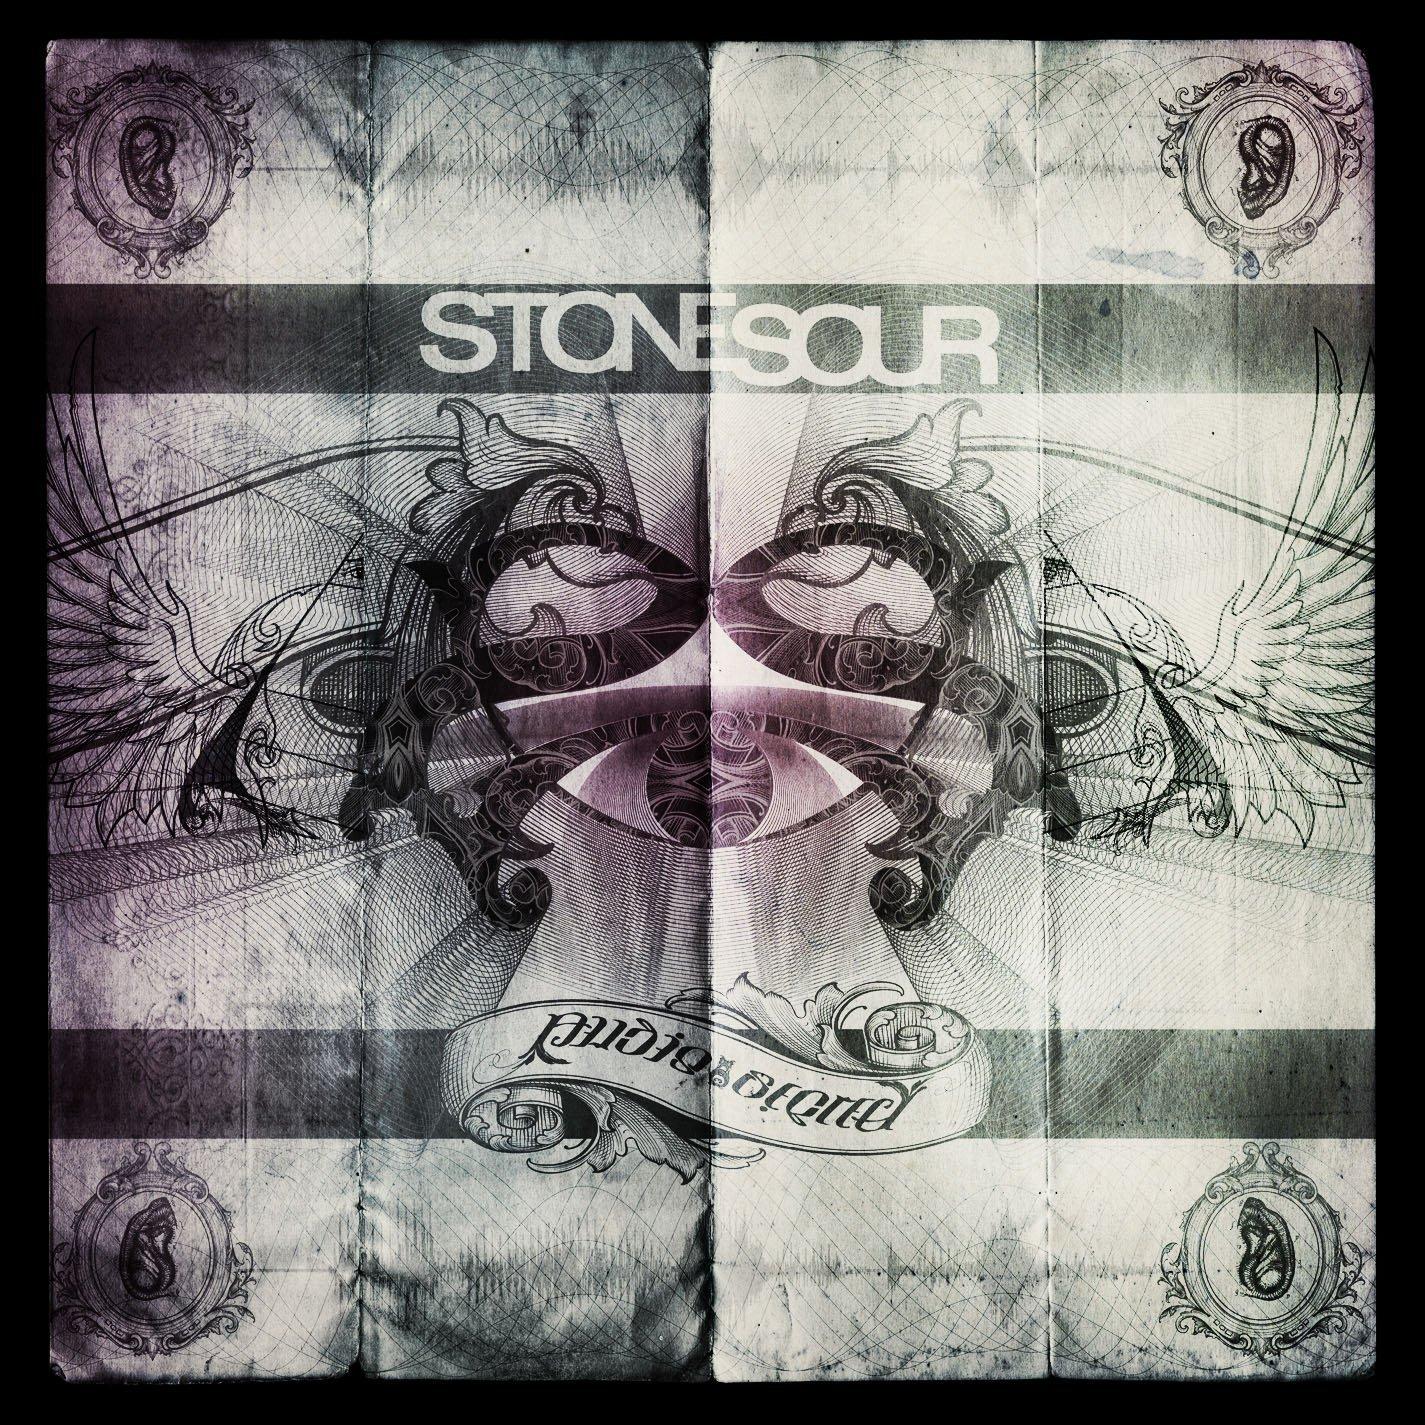 Stone Sour - Audio Secrecy